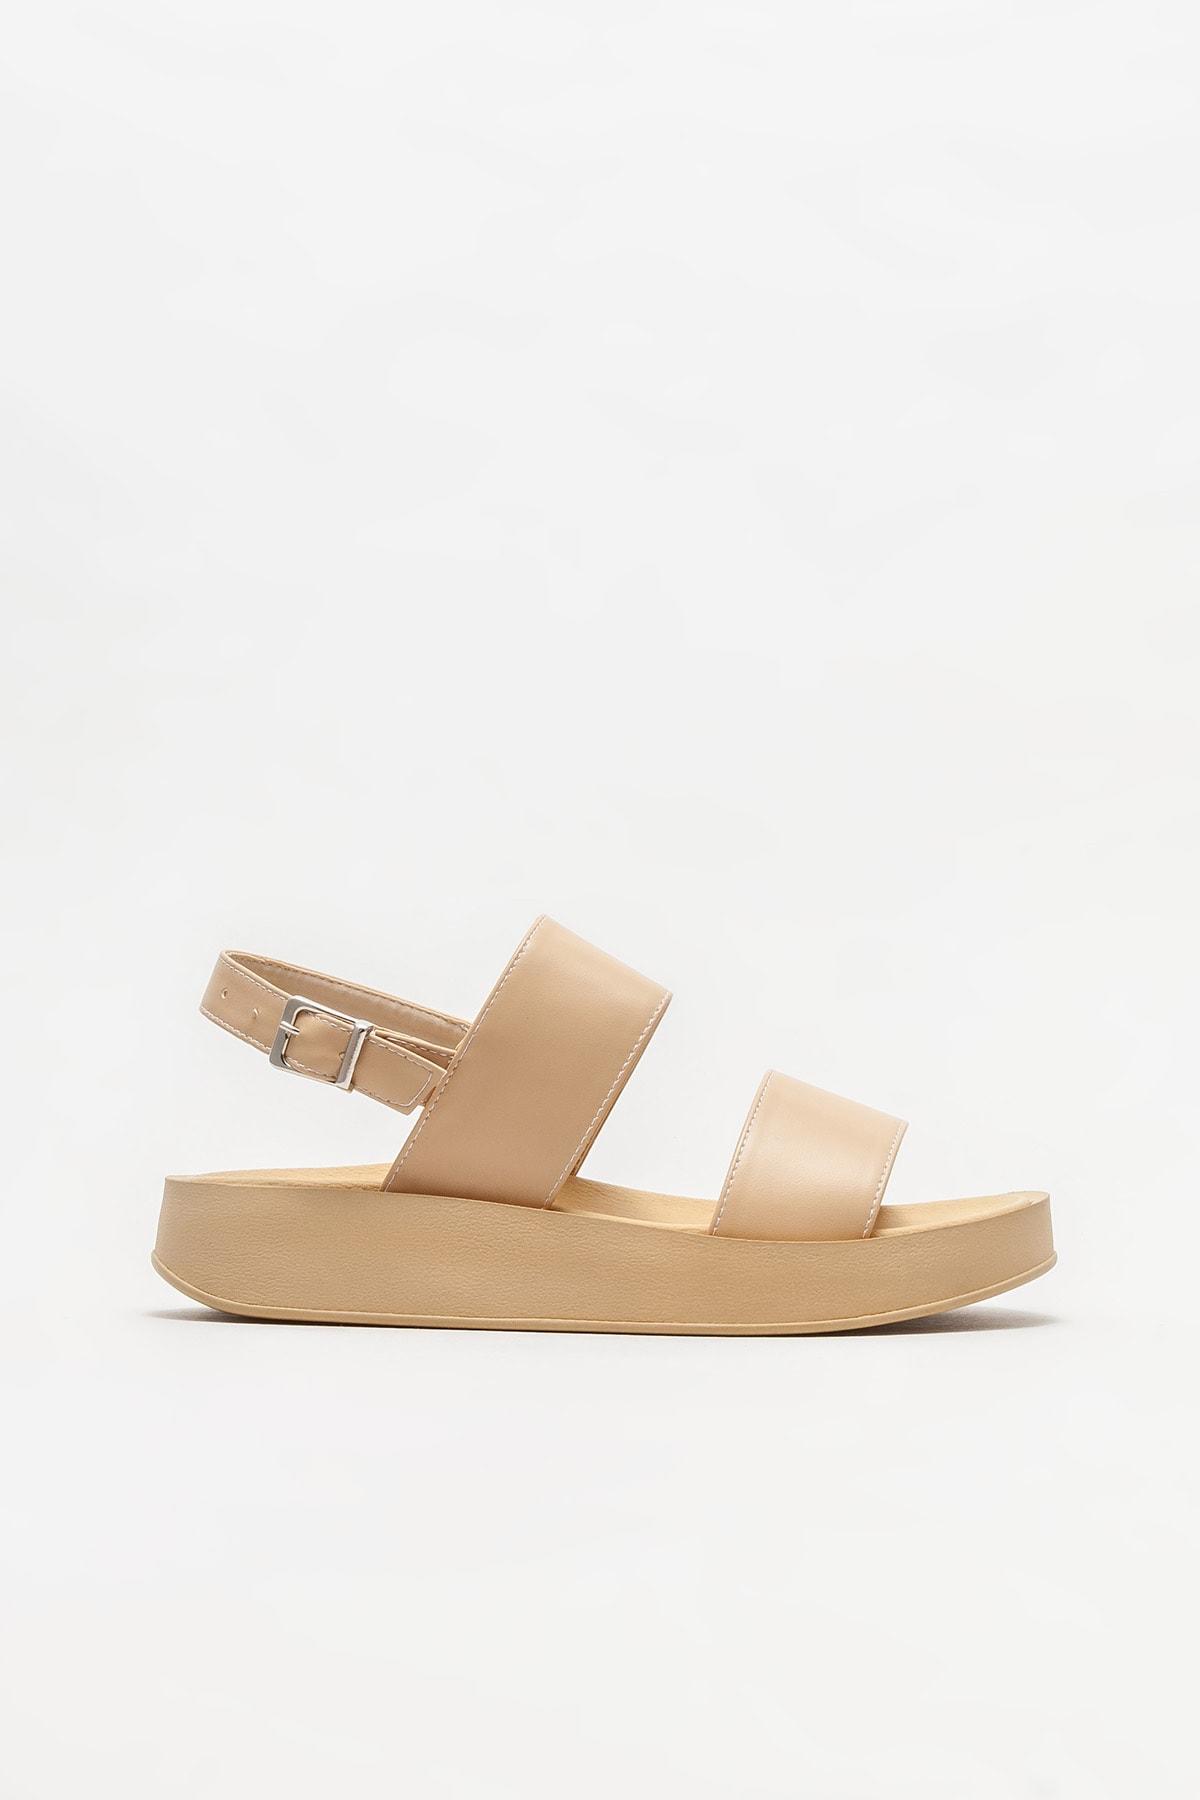 Naturel Kadın Dolgu Topuklu Sandalet